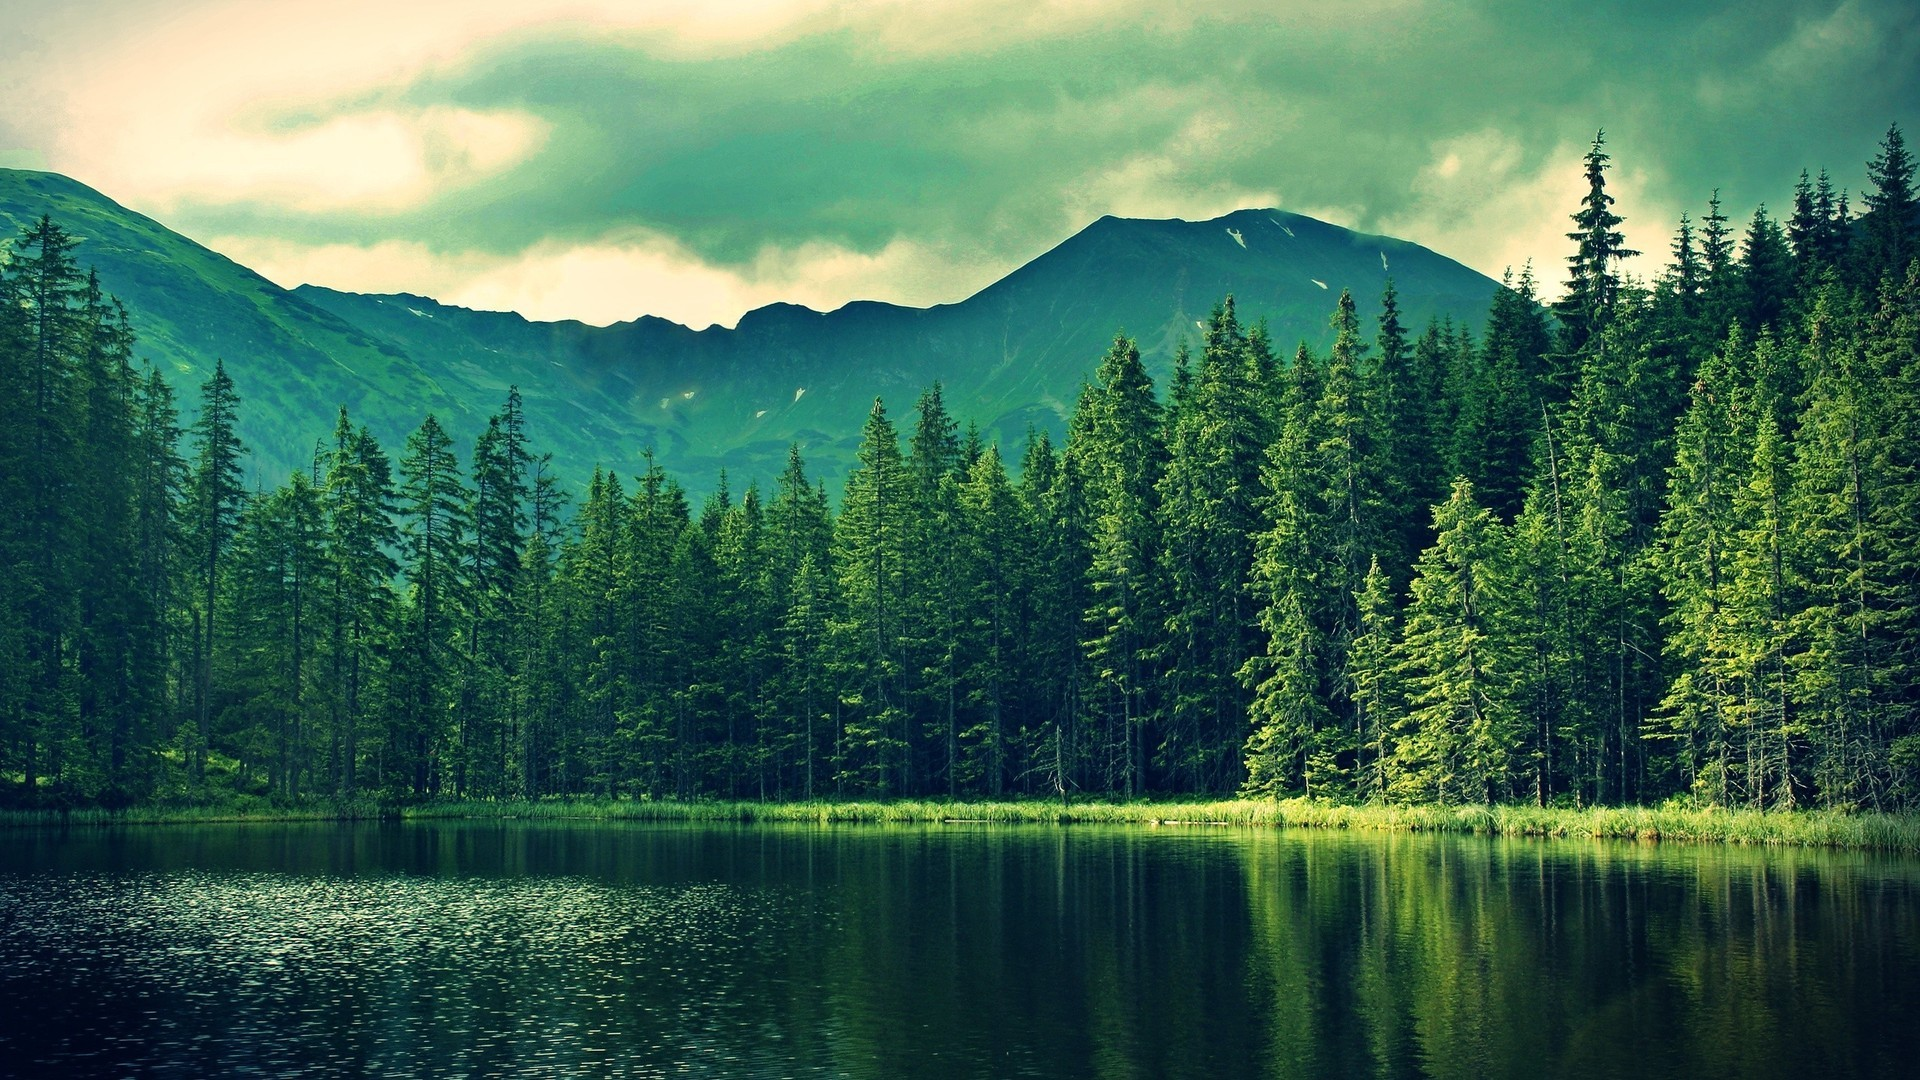 Wallpapers Hd Forest Hd Desktop Wallpapers Amazing - Desktop Wallpaper Forest - HD Wallpaper